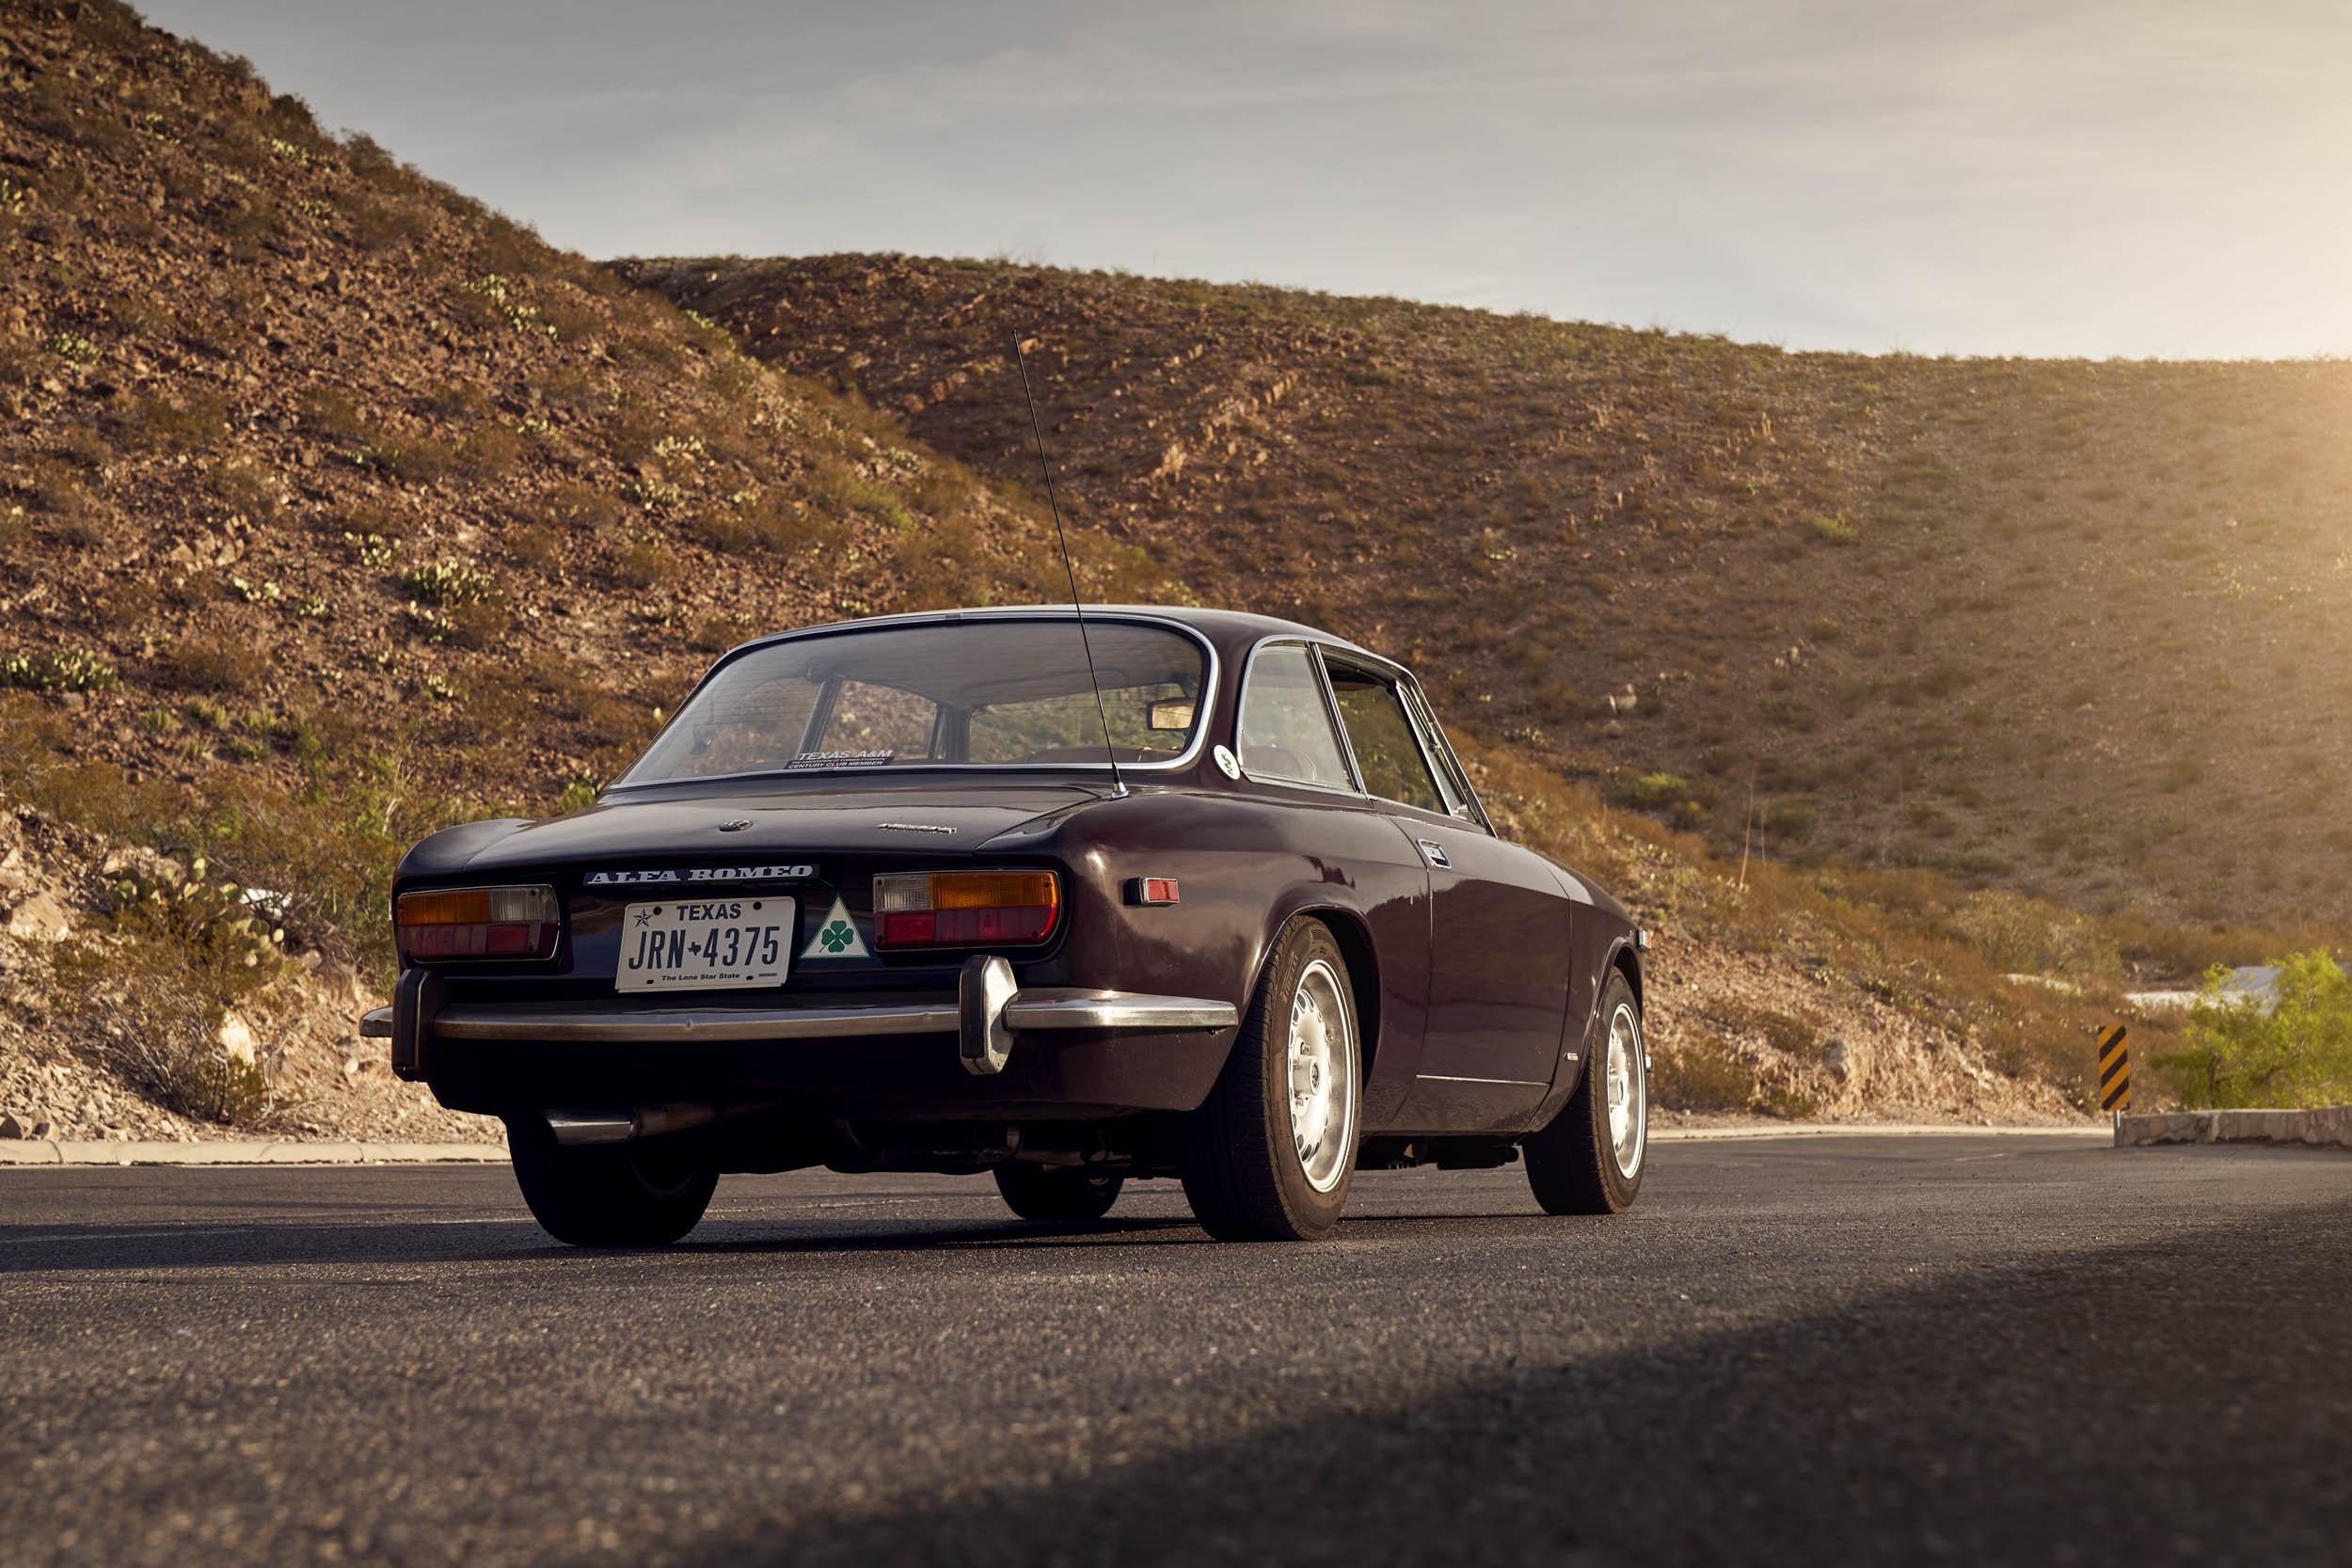 Alfa Romeo GTV rear 3/4 in the mountains